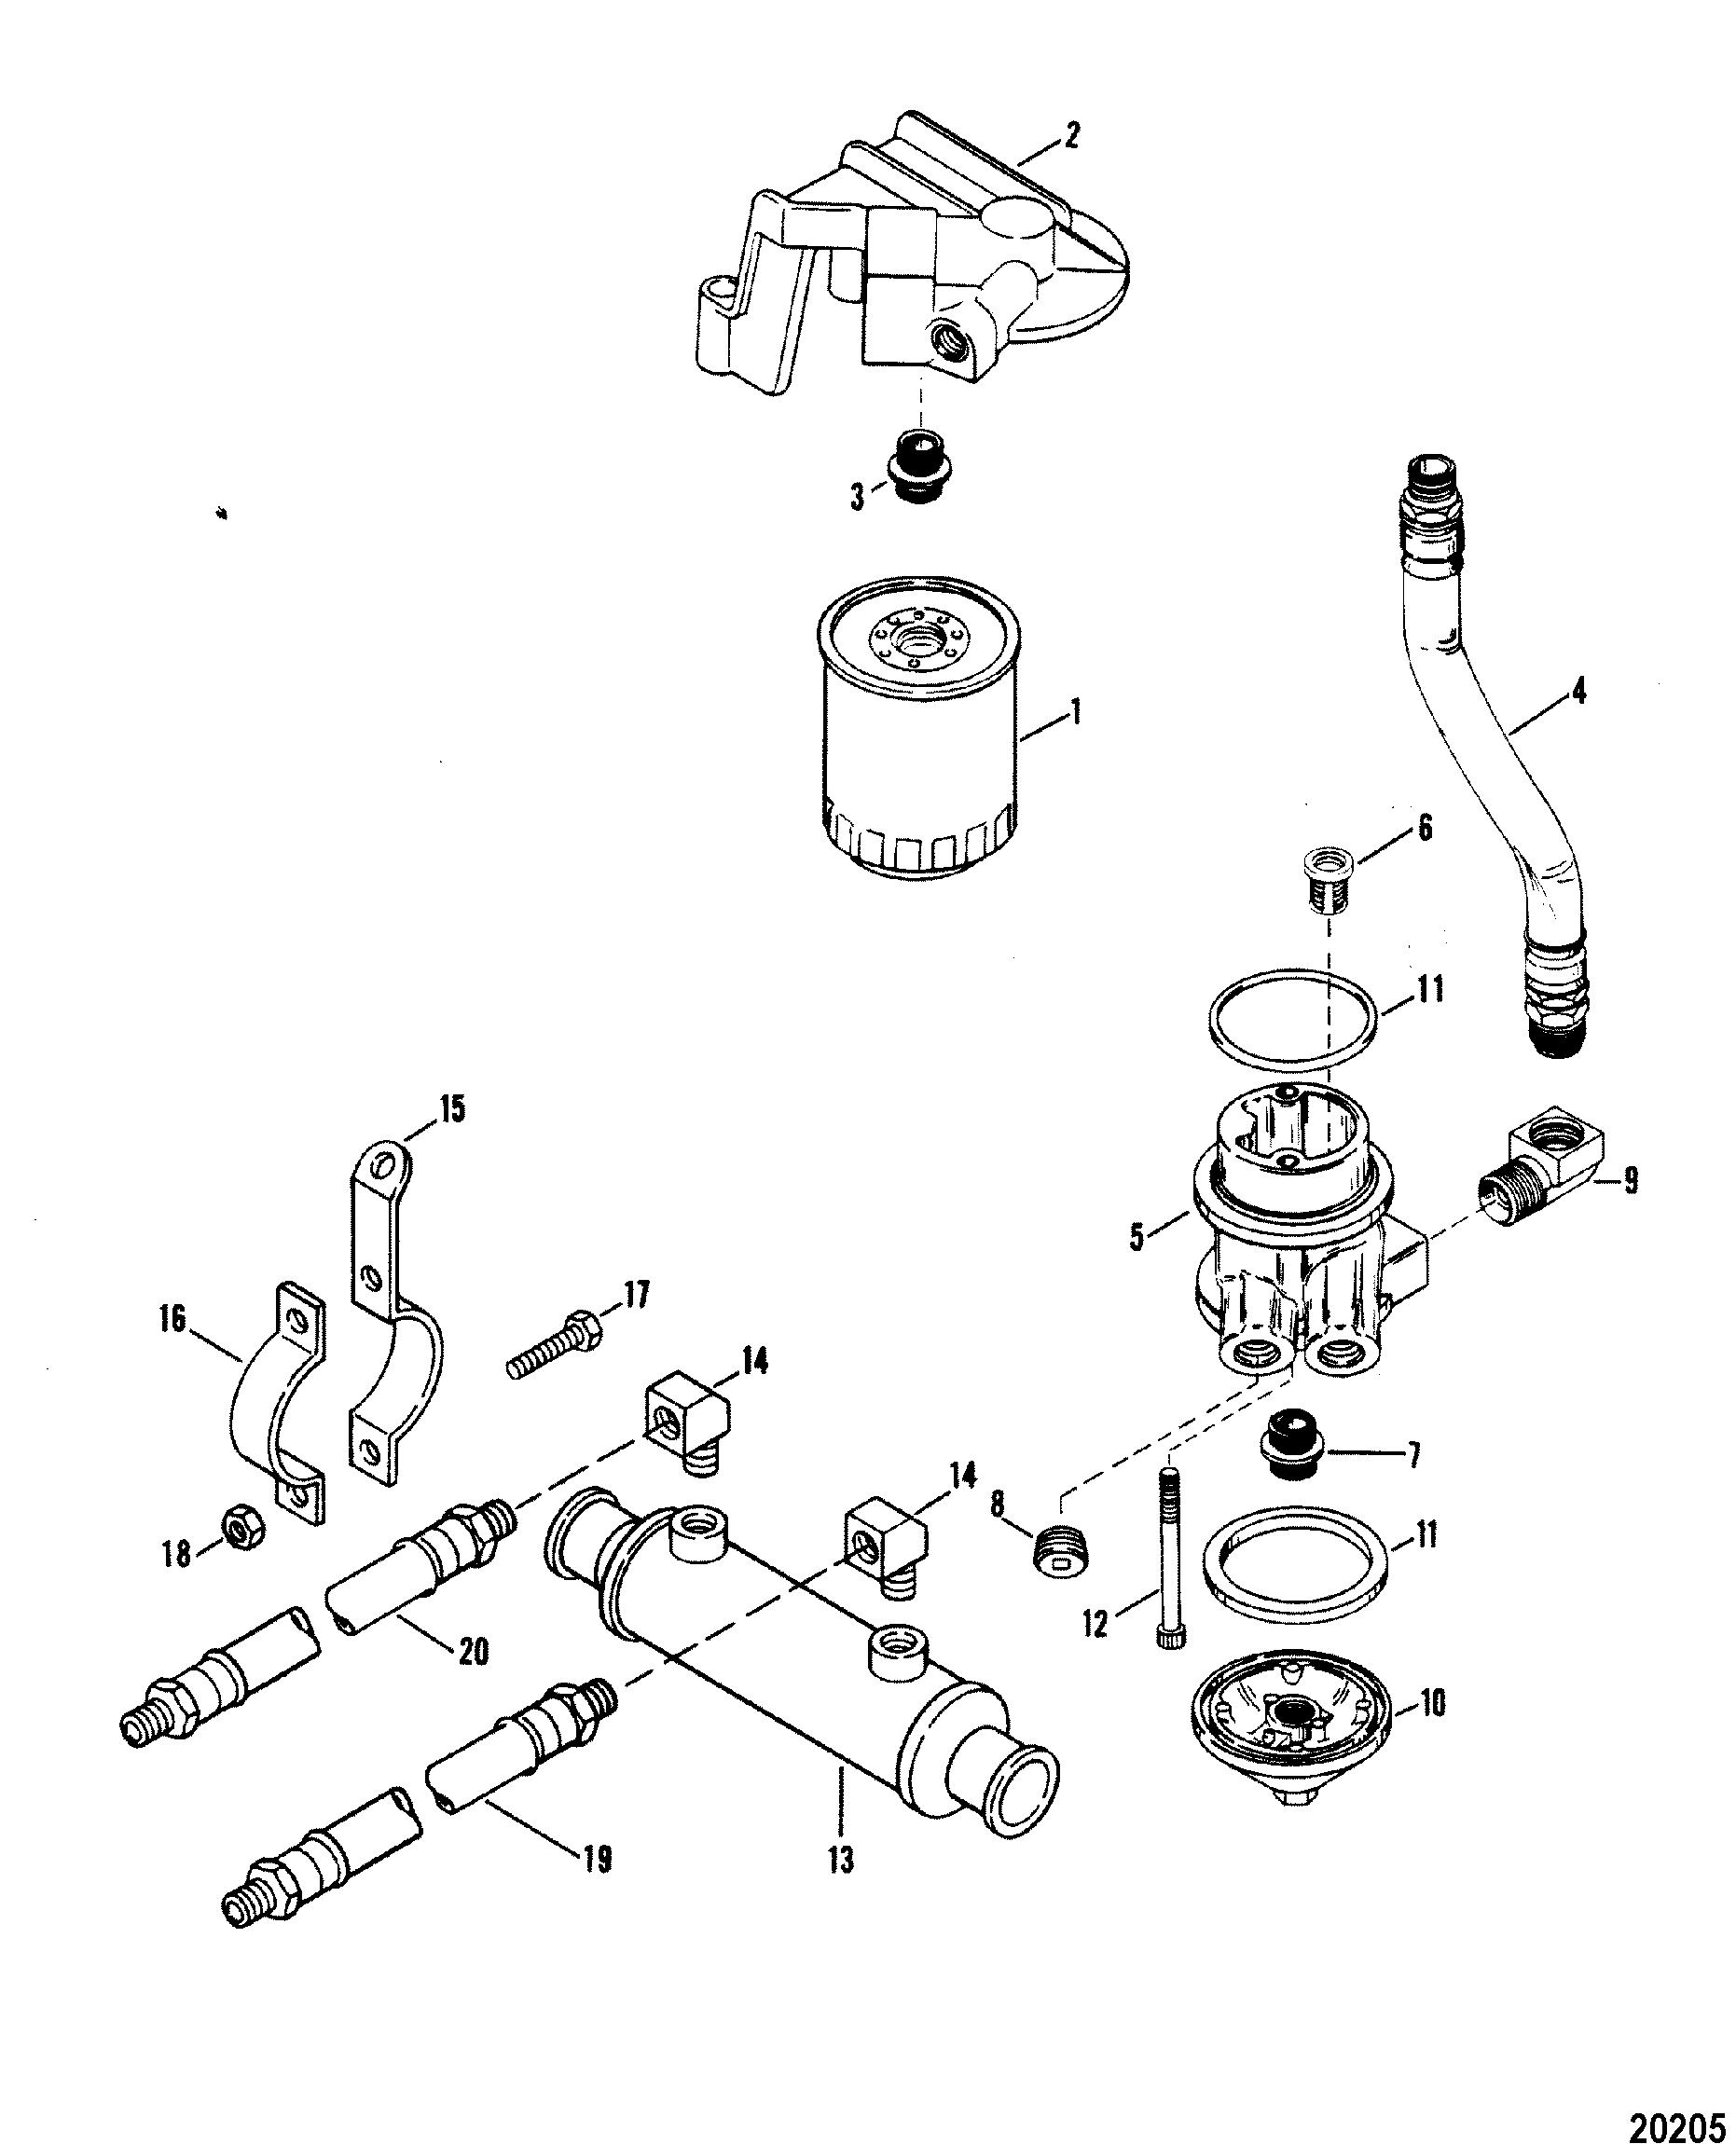 Array oil filter and adapter for mercruiser 330 h p engine w borg warner rh jamestowndistributors